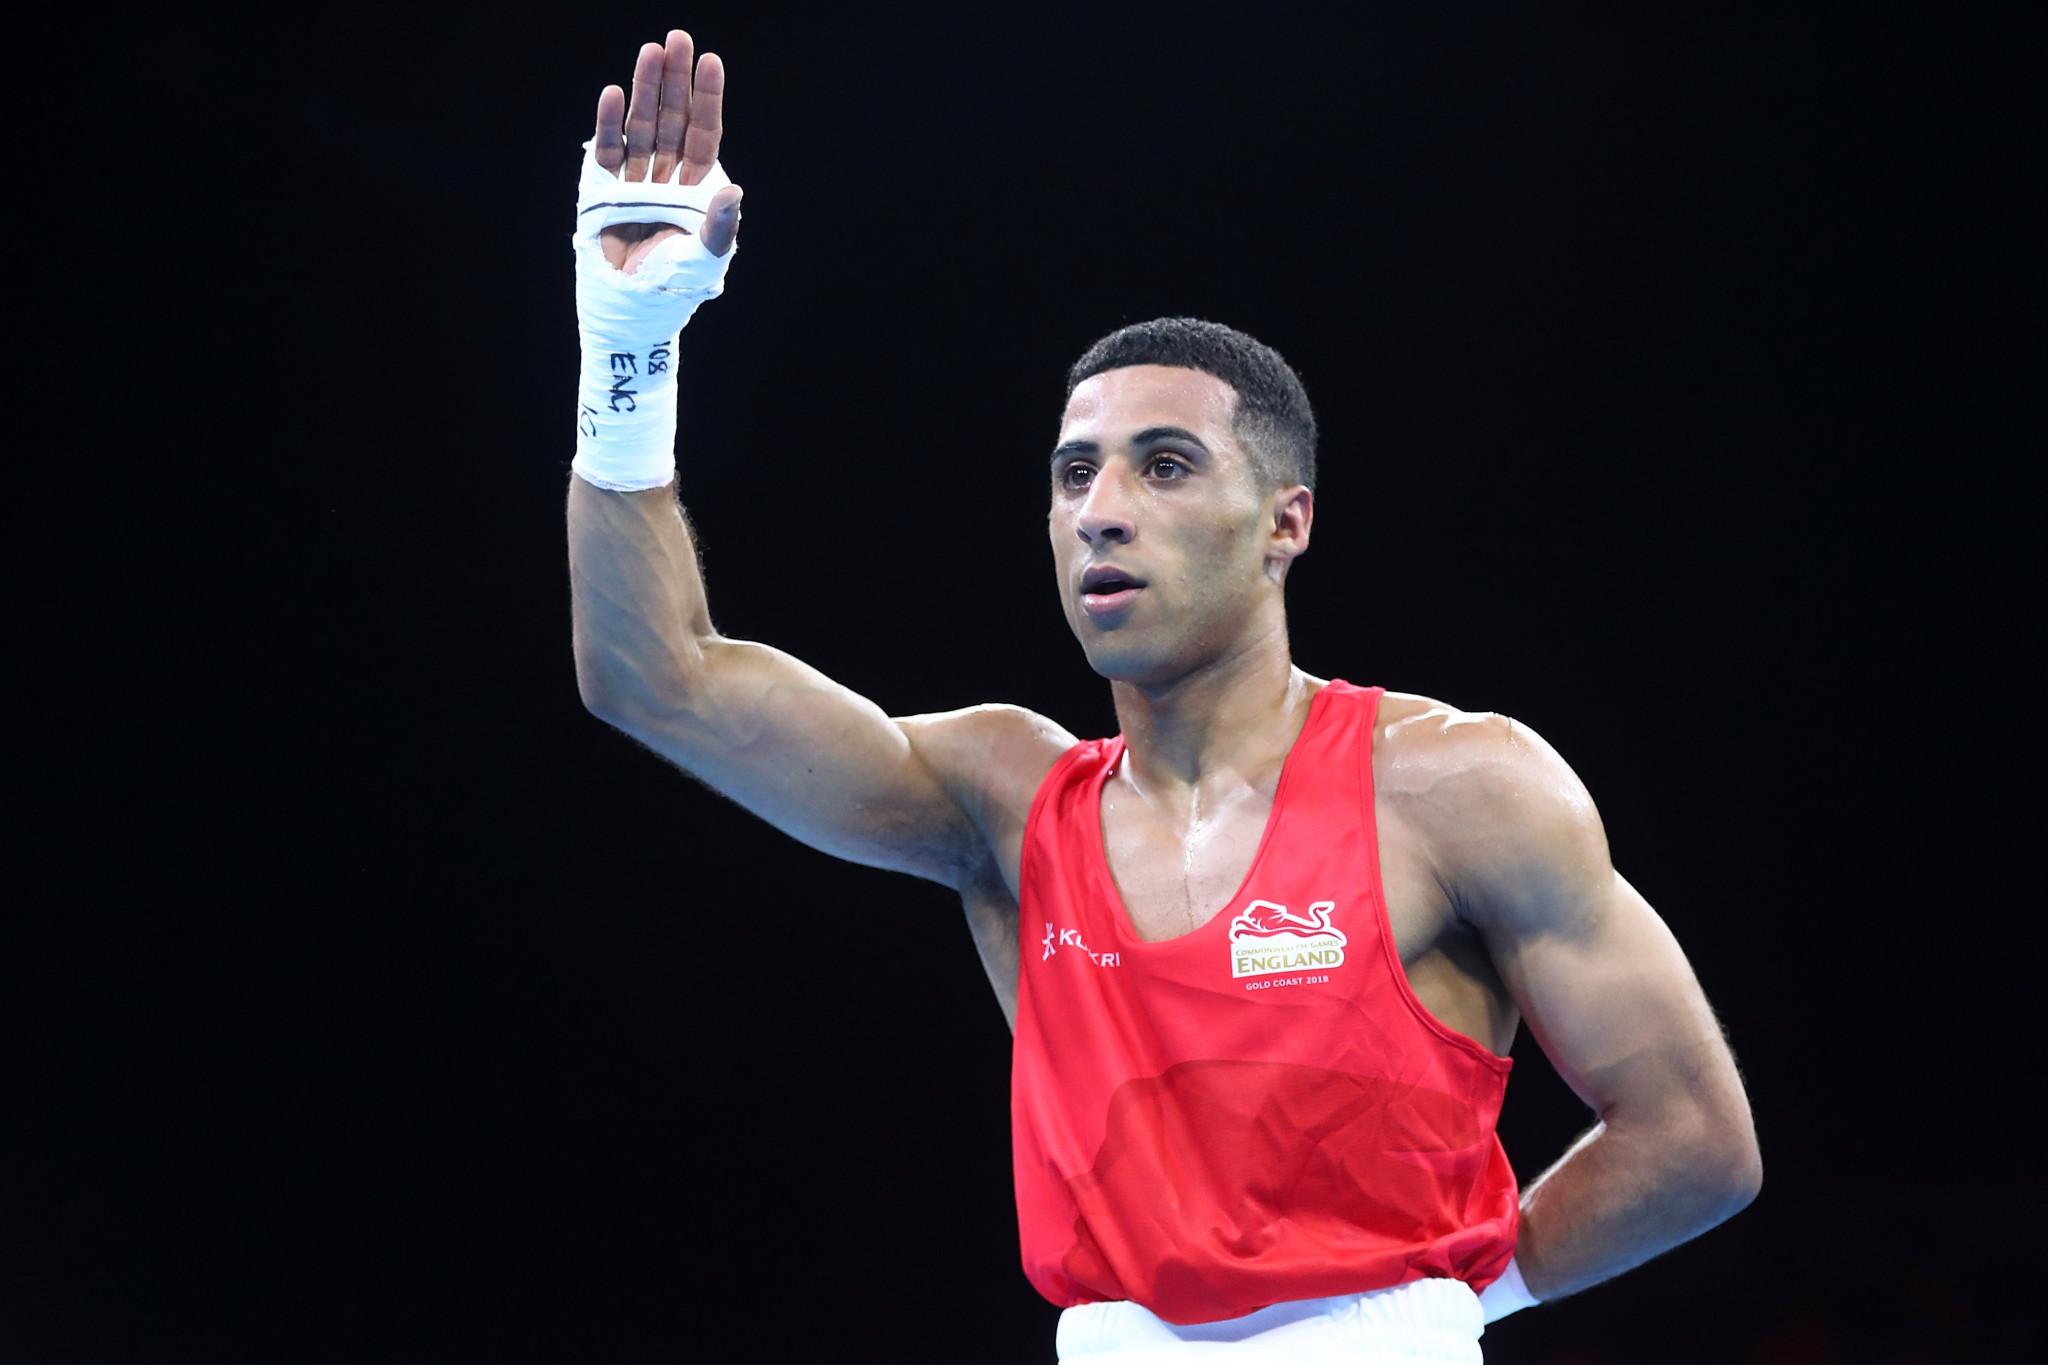 Galal Yafai won the light flyweight title at Gold Coast 2018 ©Getty Images